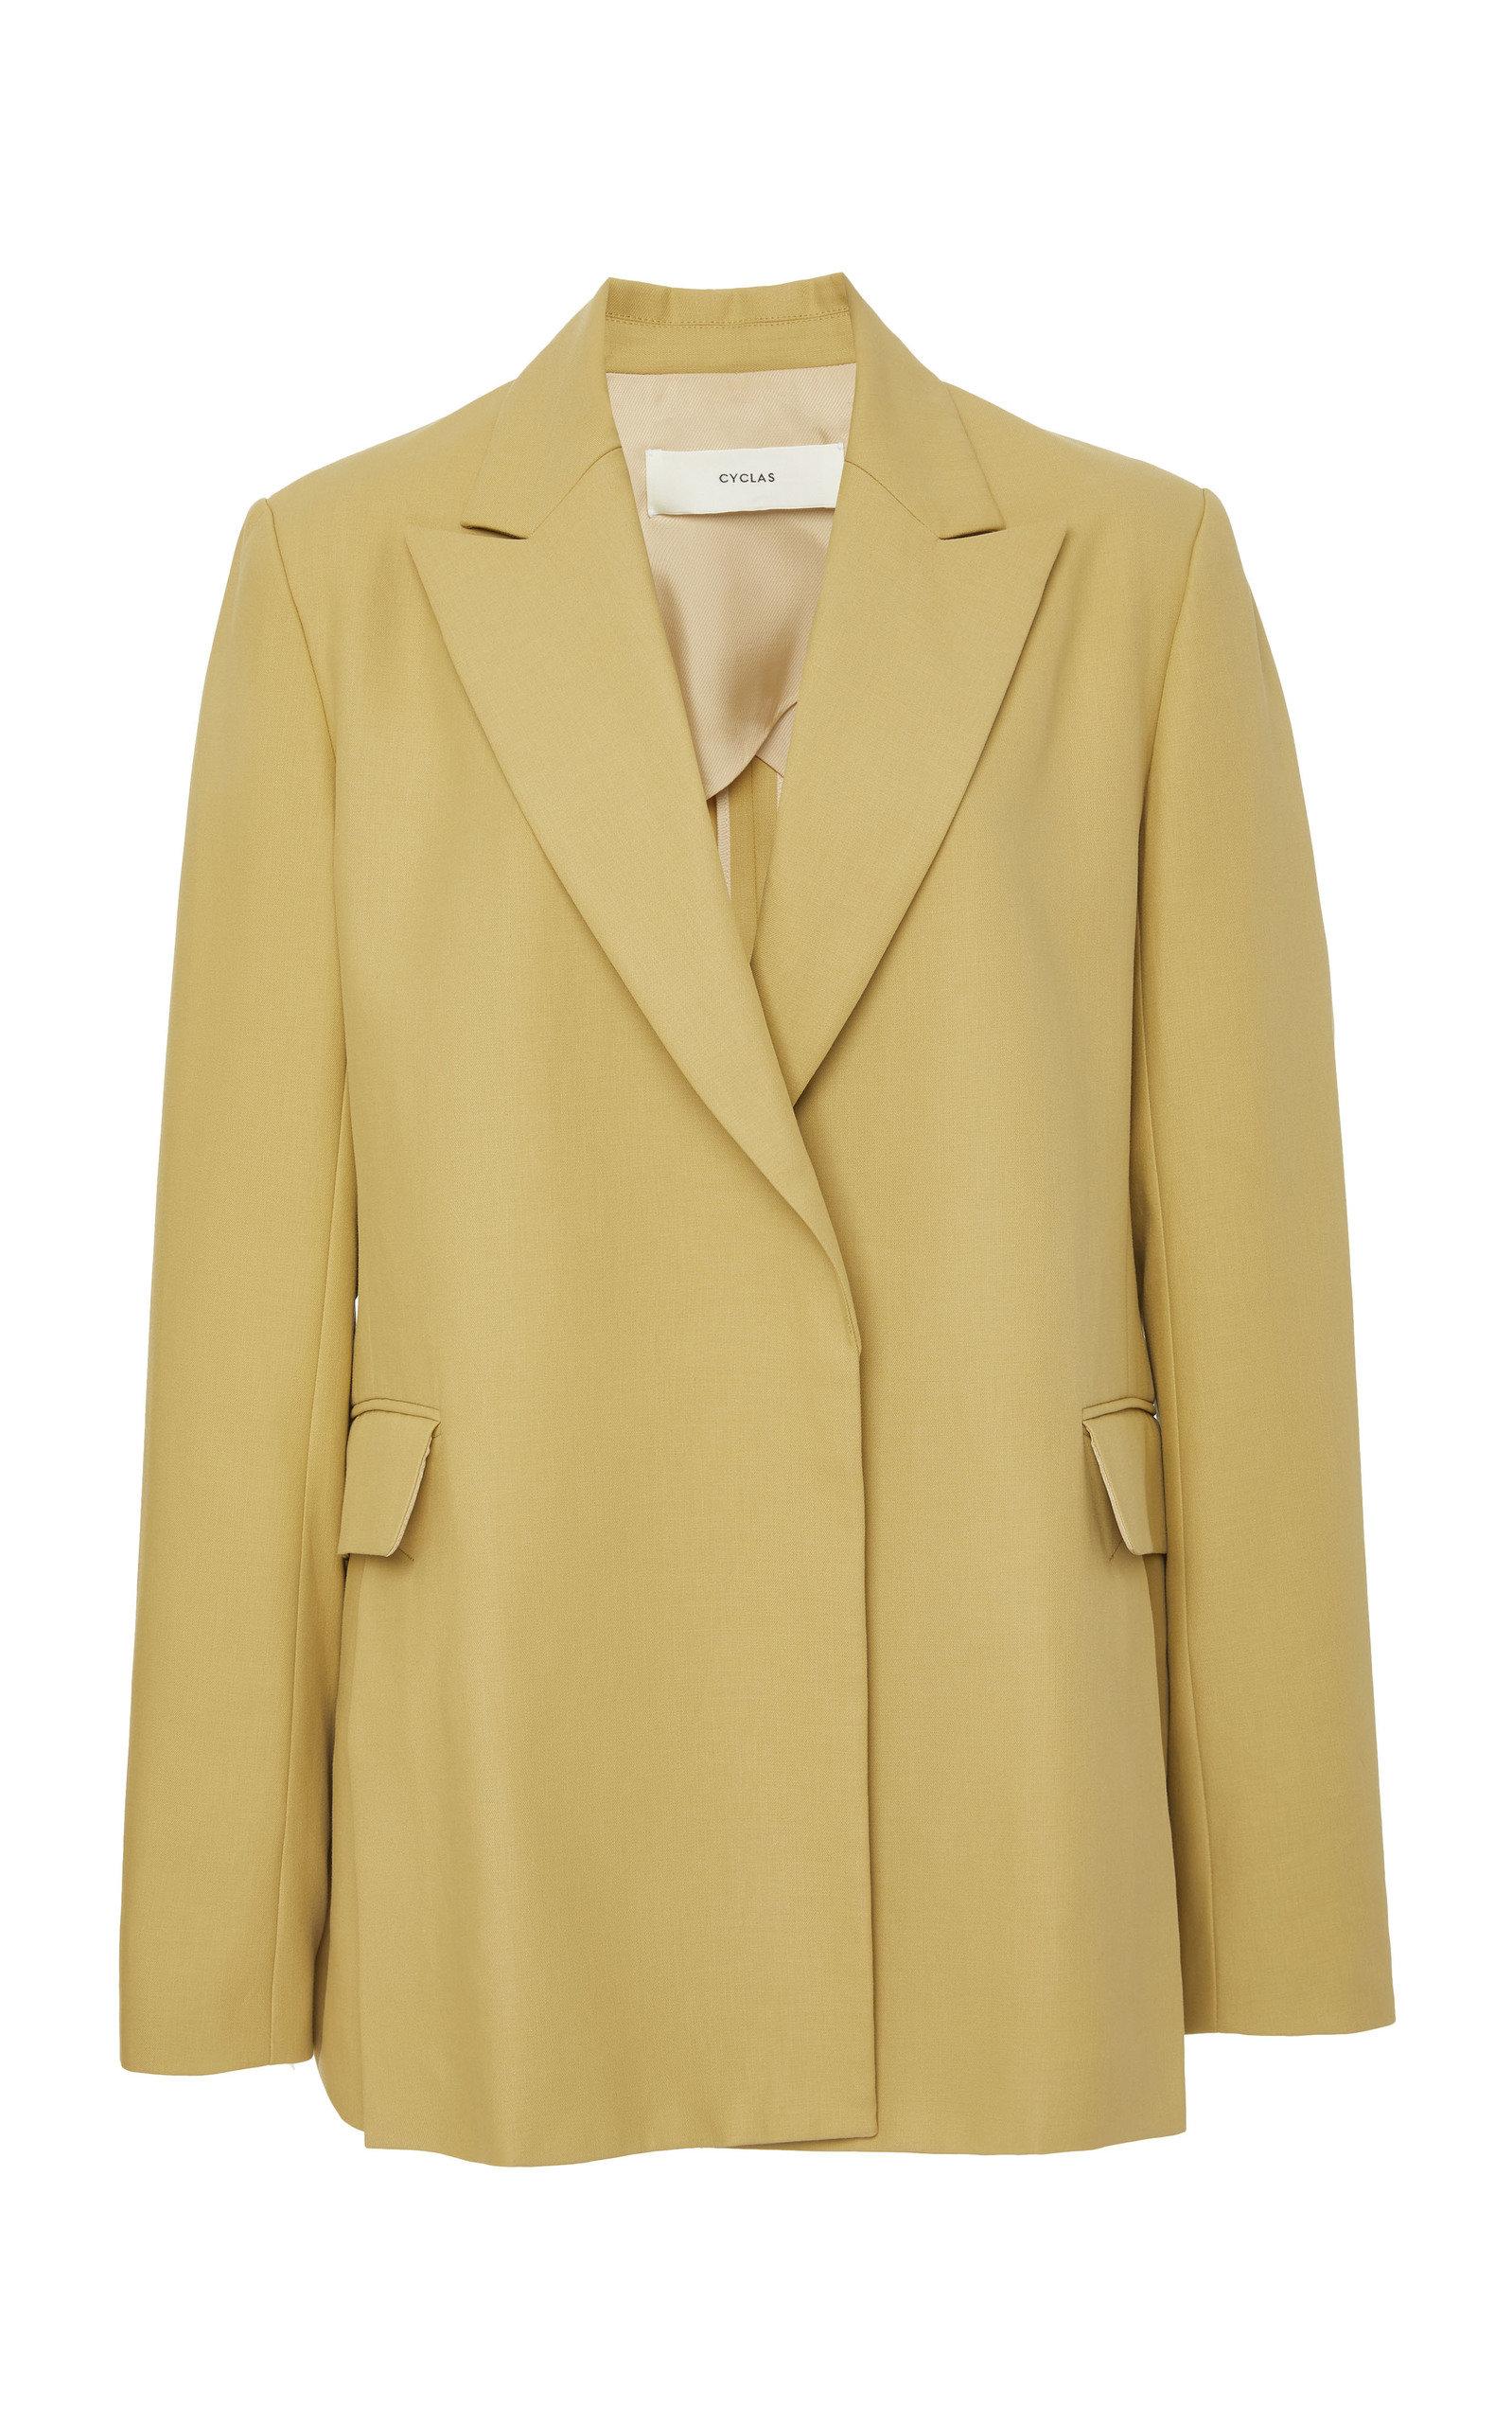 COTTON CLOTH BLAZER JACKET